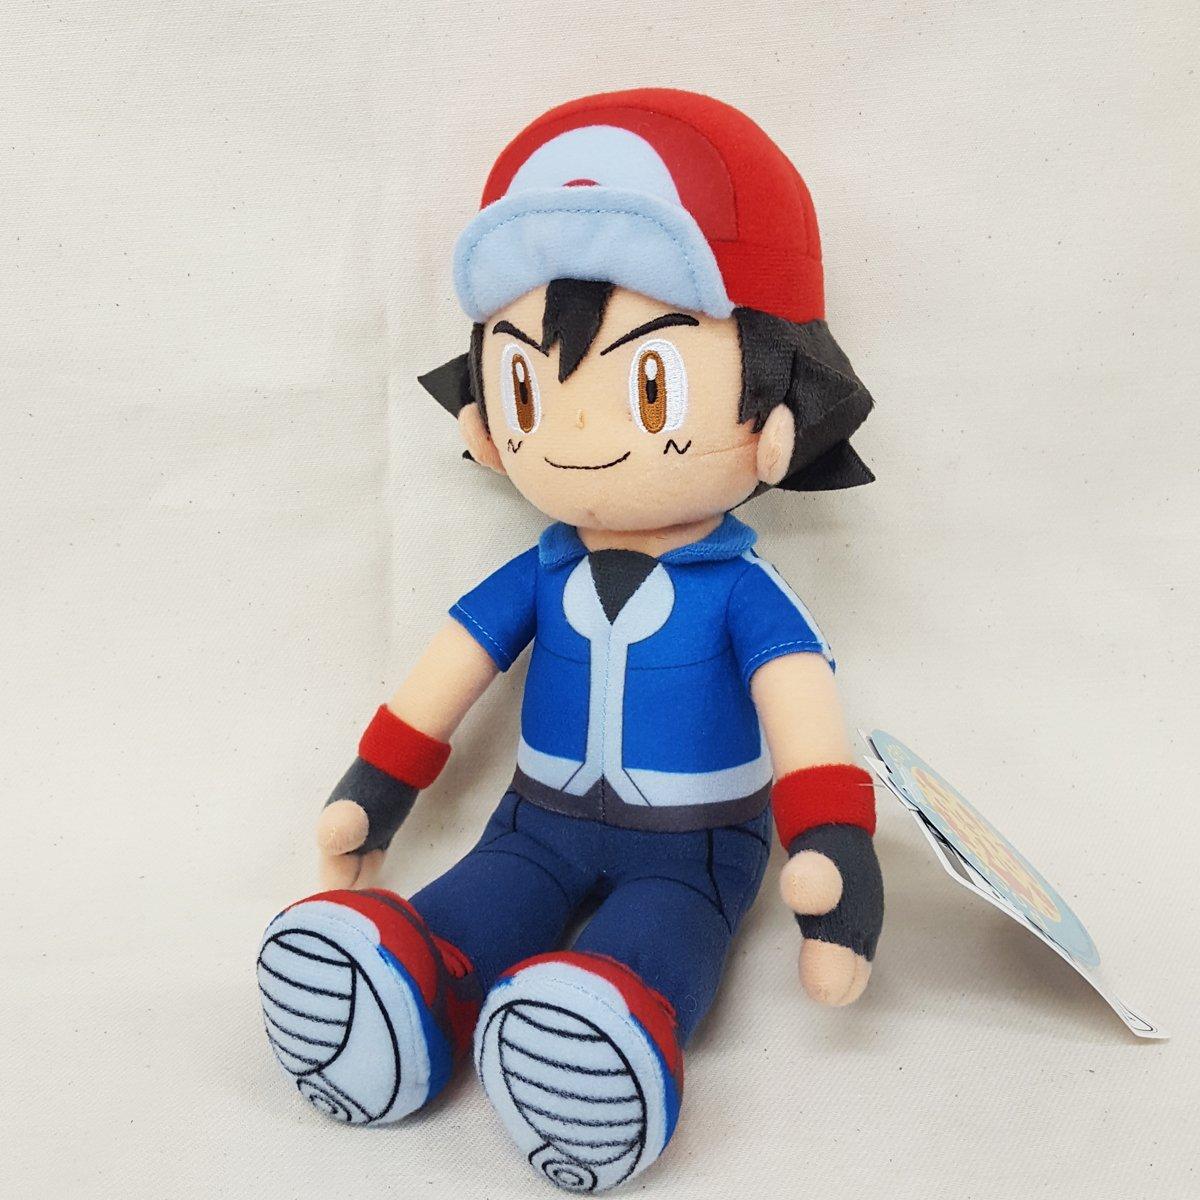 amazon com sekiguchi pokemon ash ketchum satoshi stuffed plush